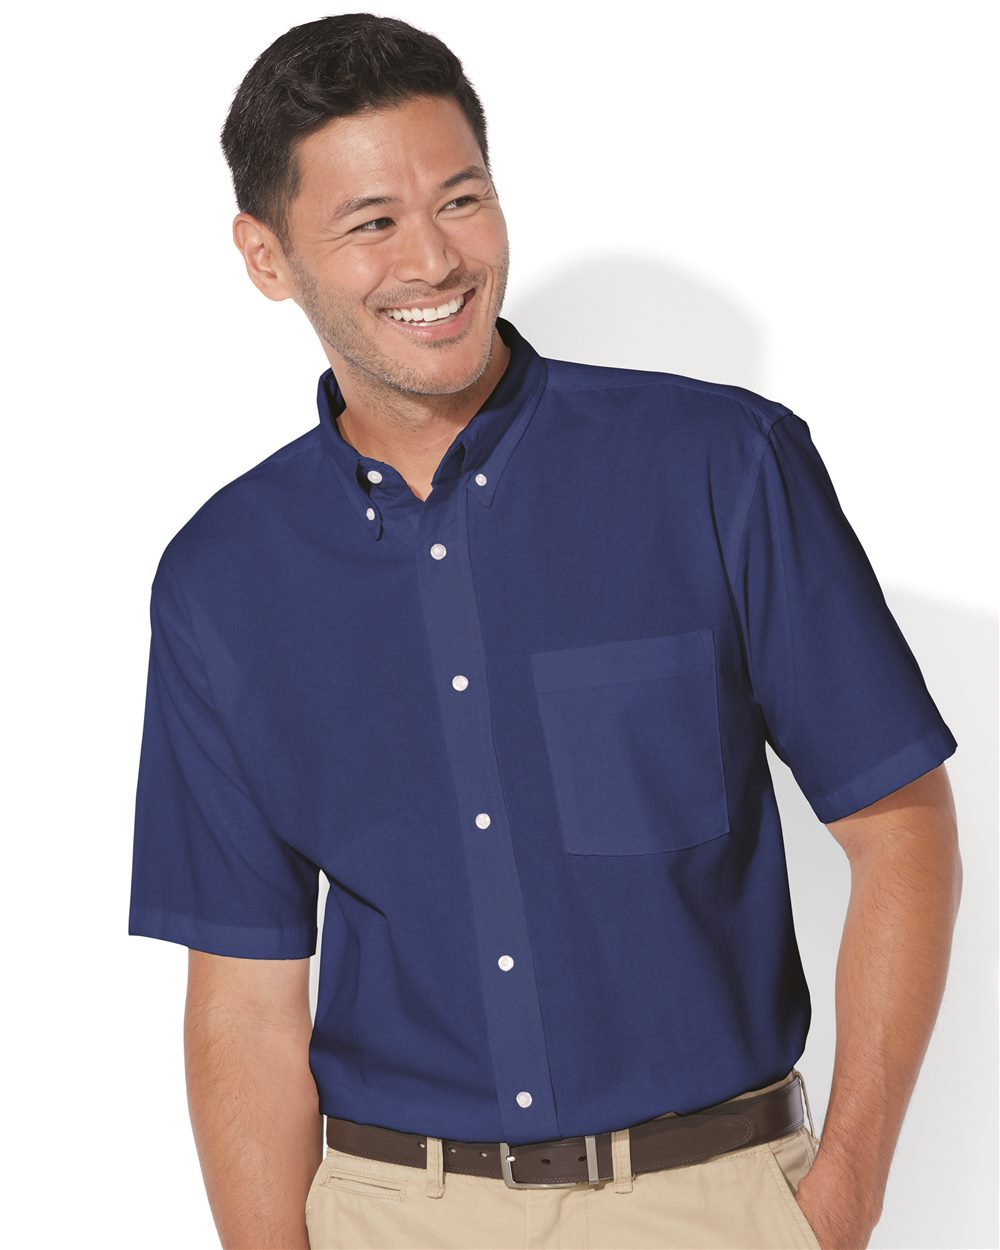 FeatherLite 0231 Short Sleeve Oxford Shirt